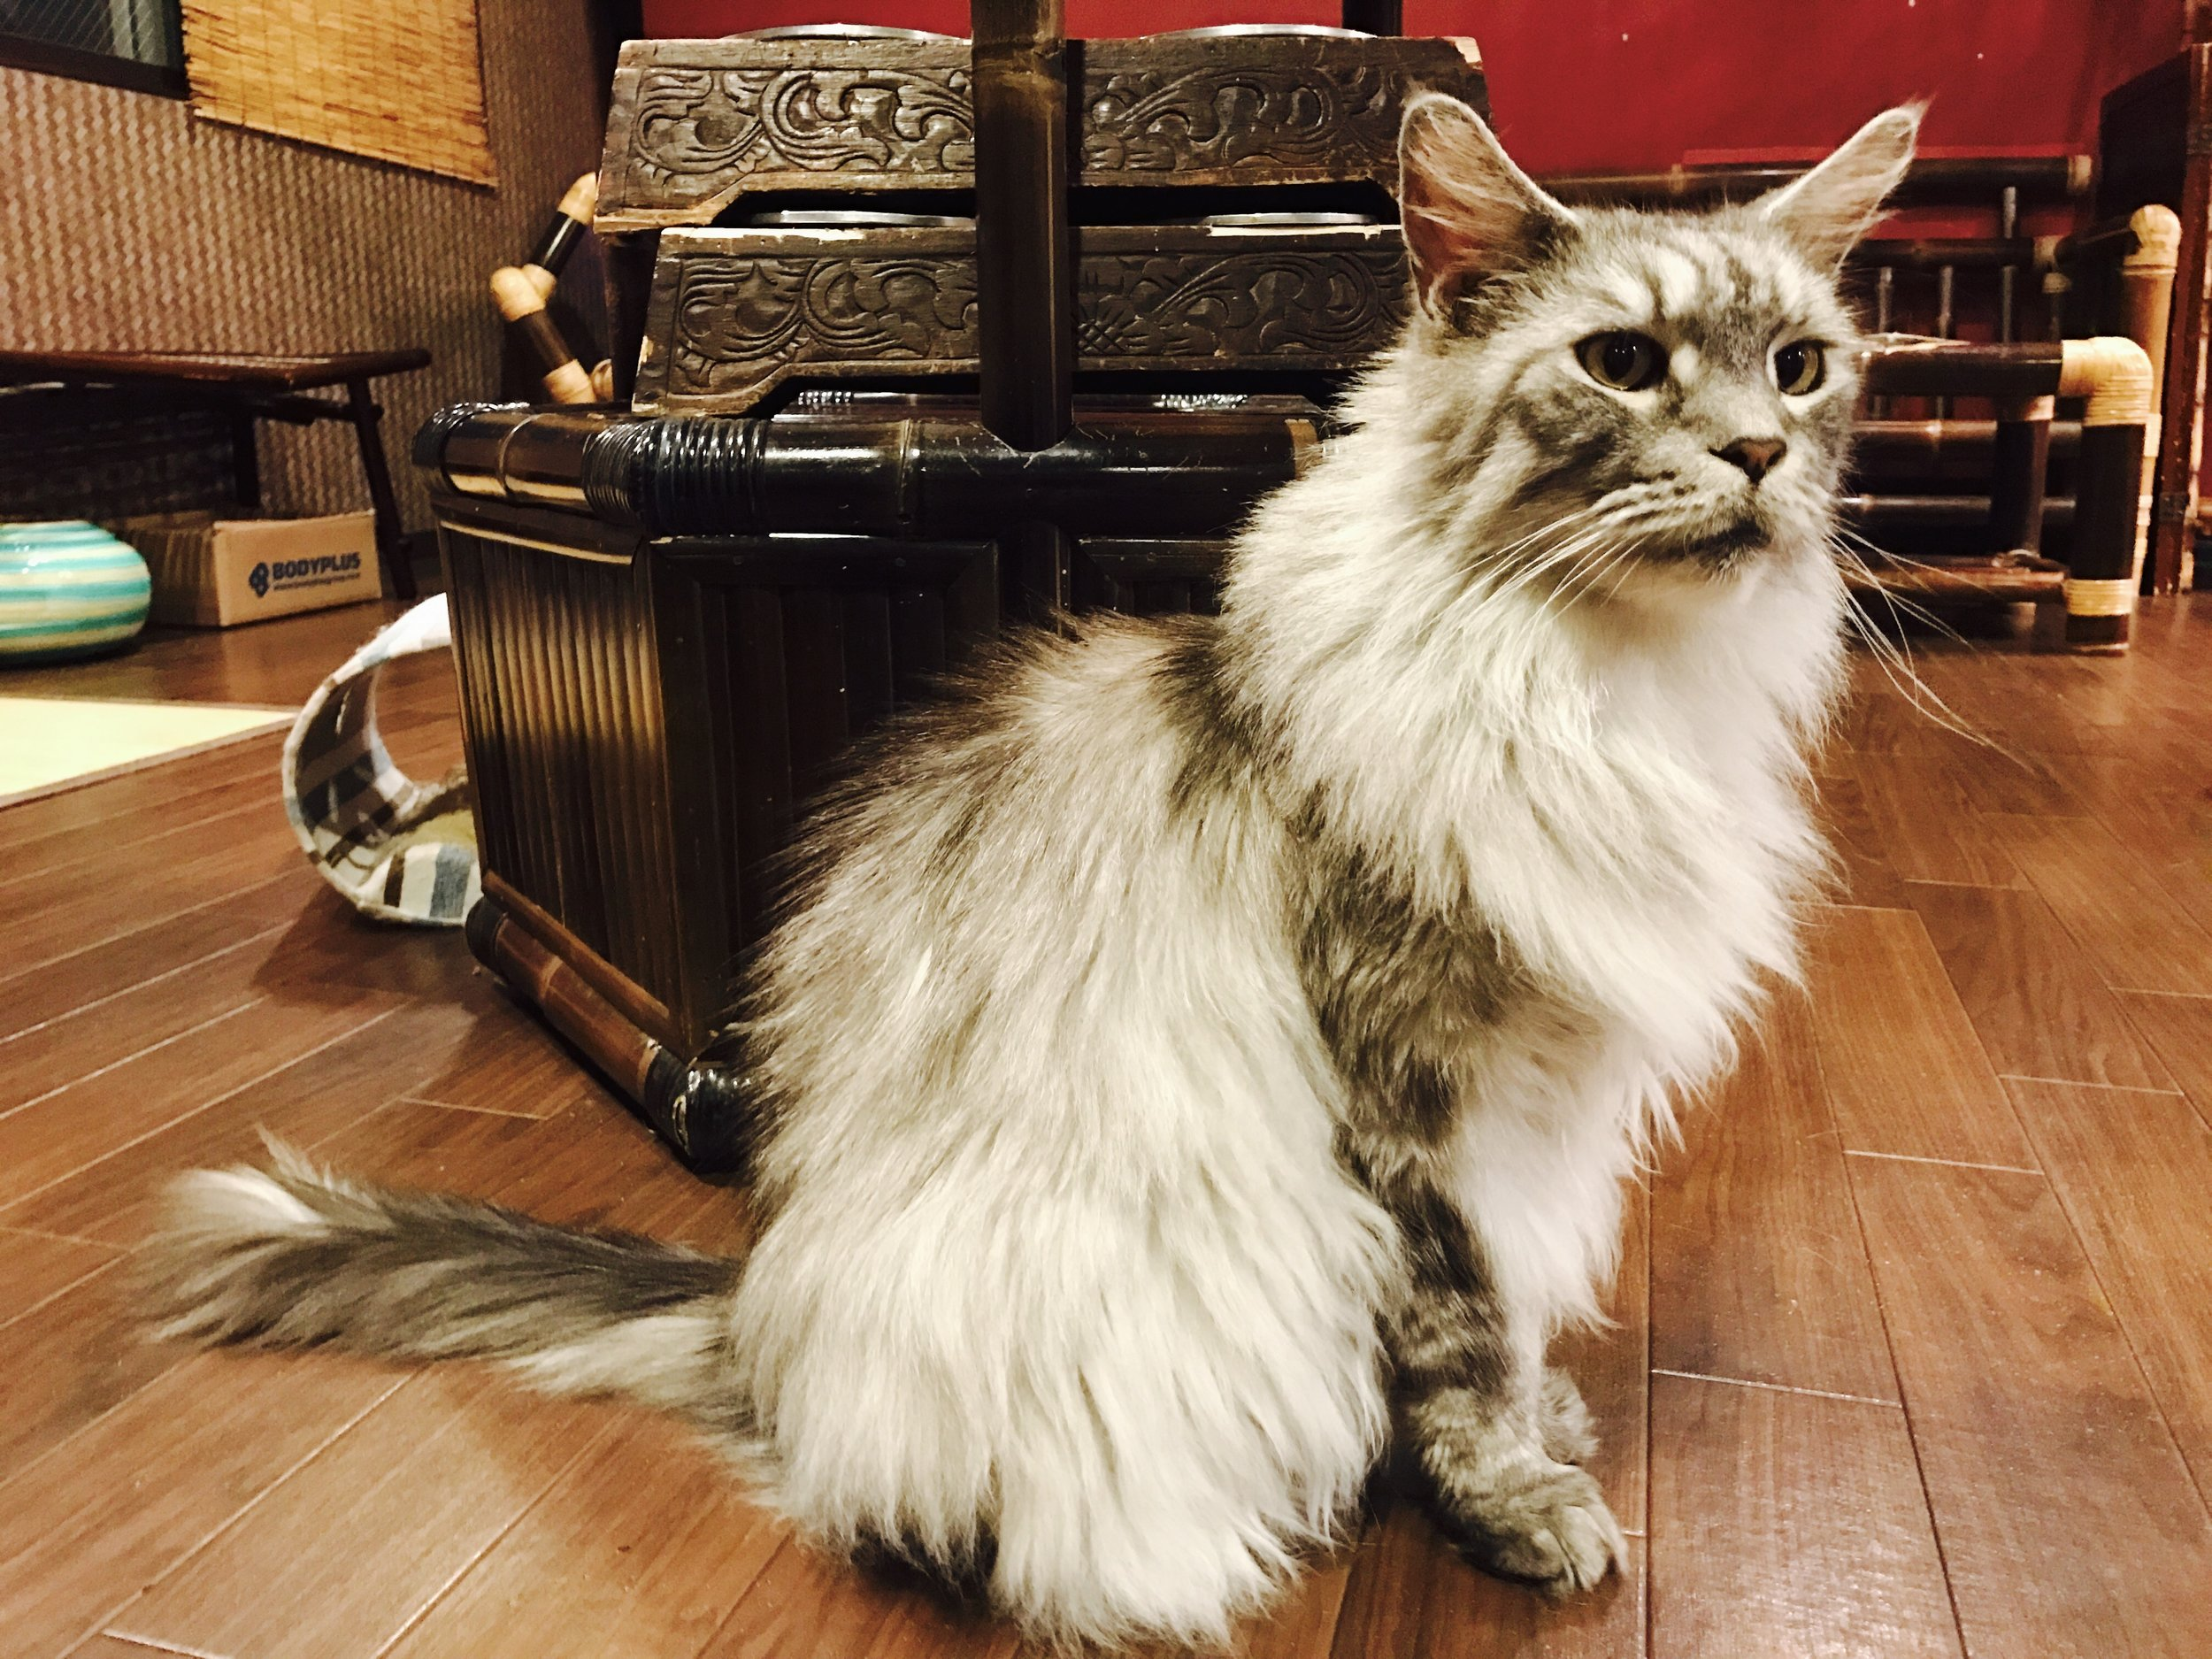 A long-haired feline poses at Gurugurudo Neko Cafe